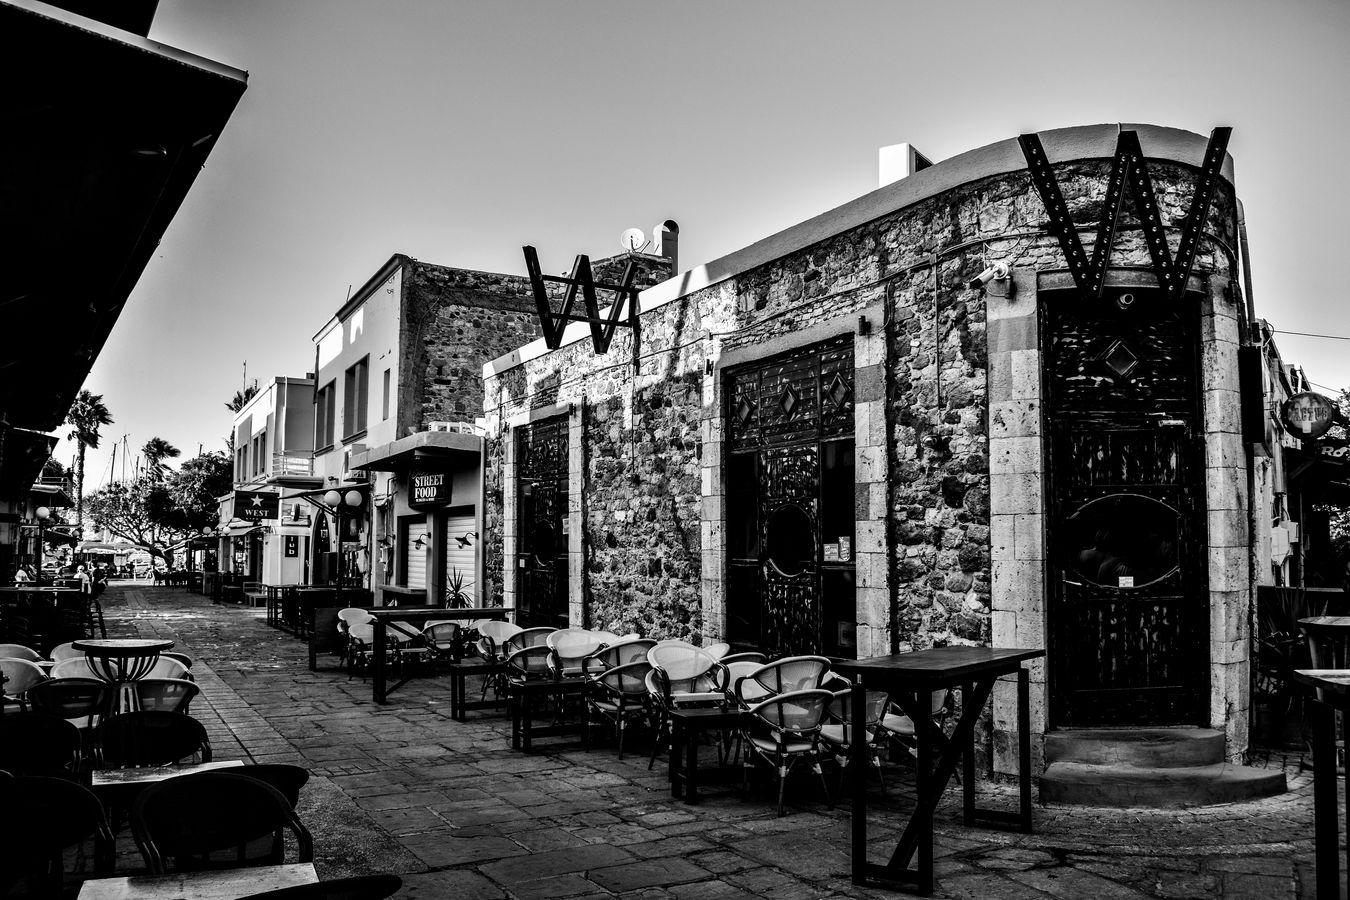 Street in Kos